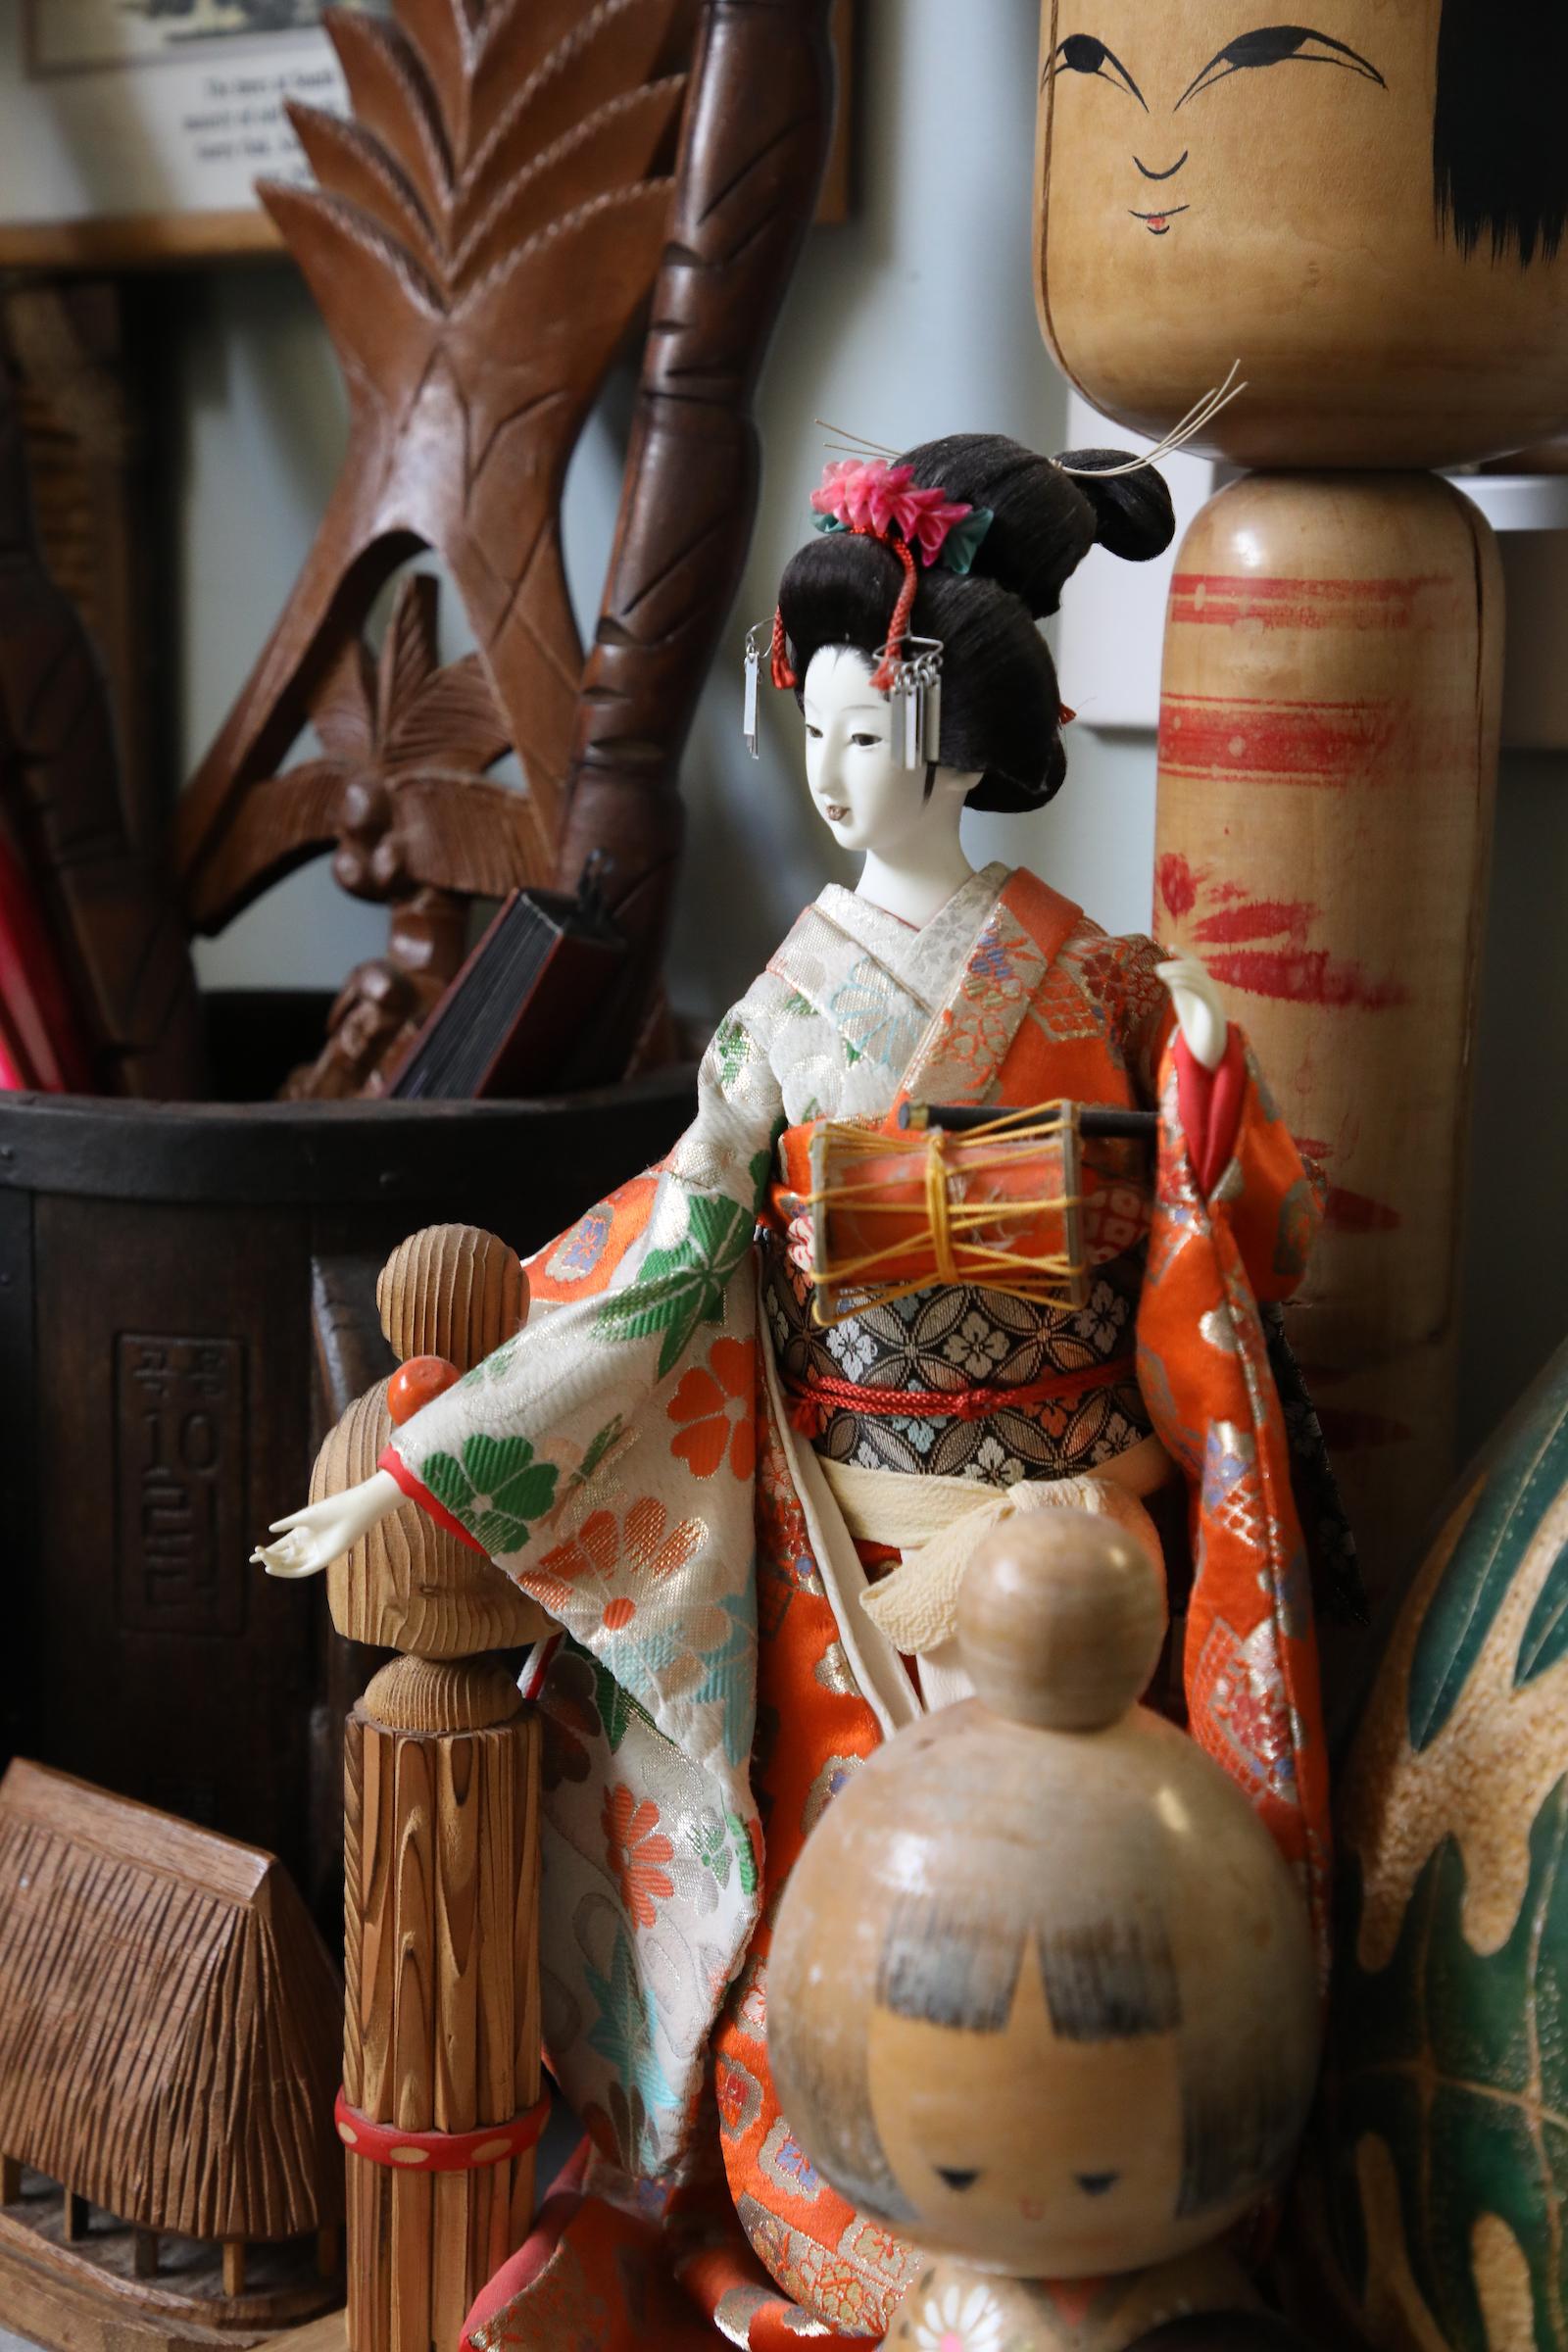 photo of a Japanese figurine